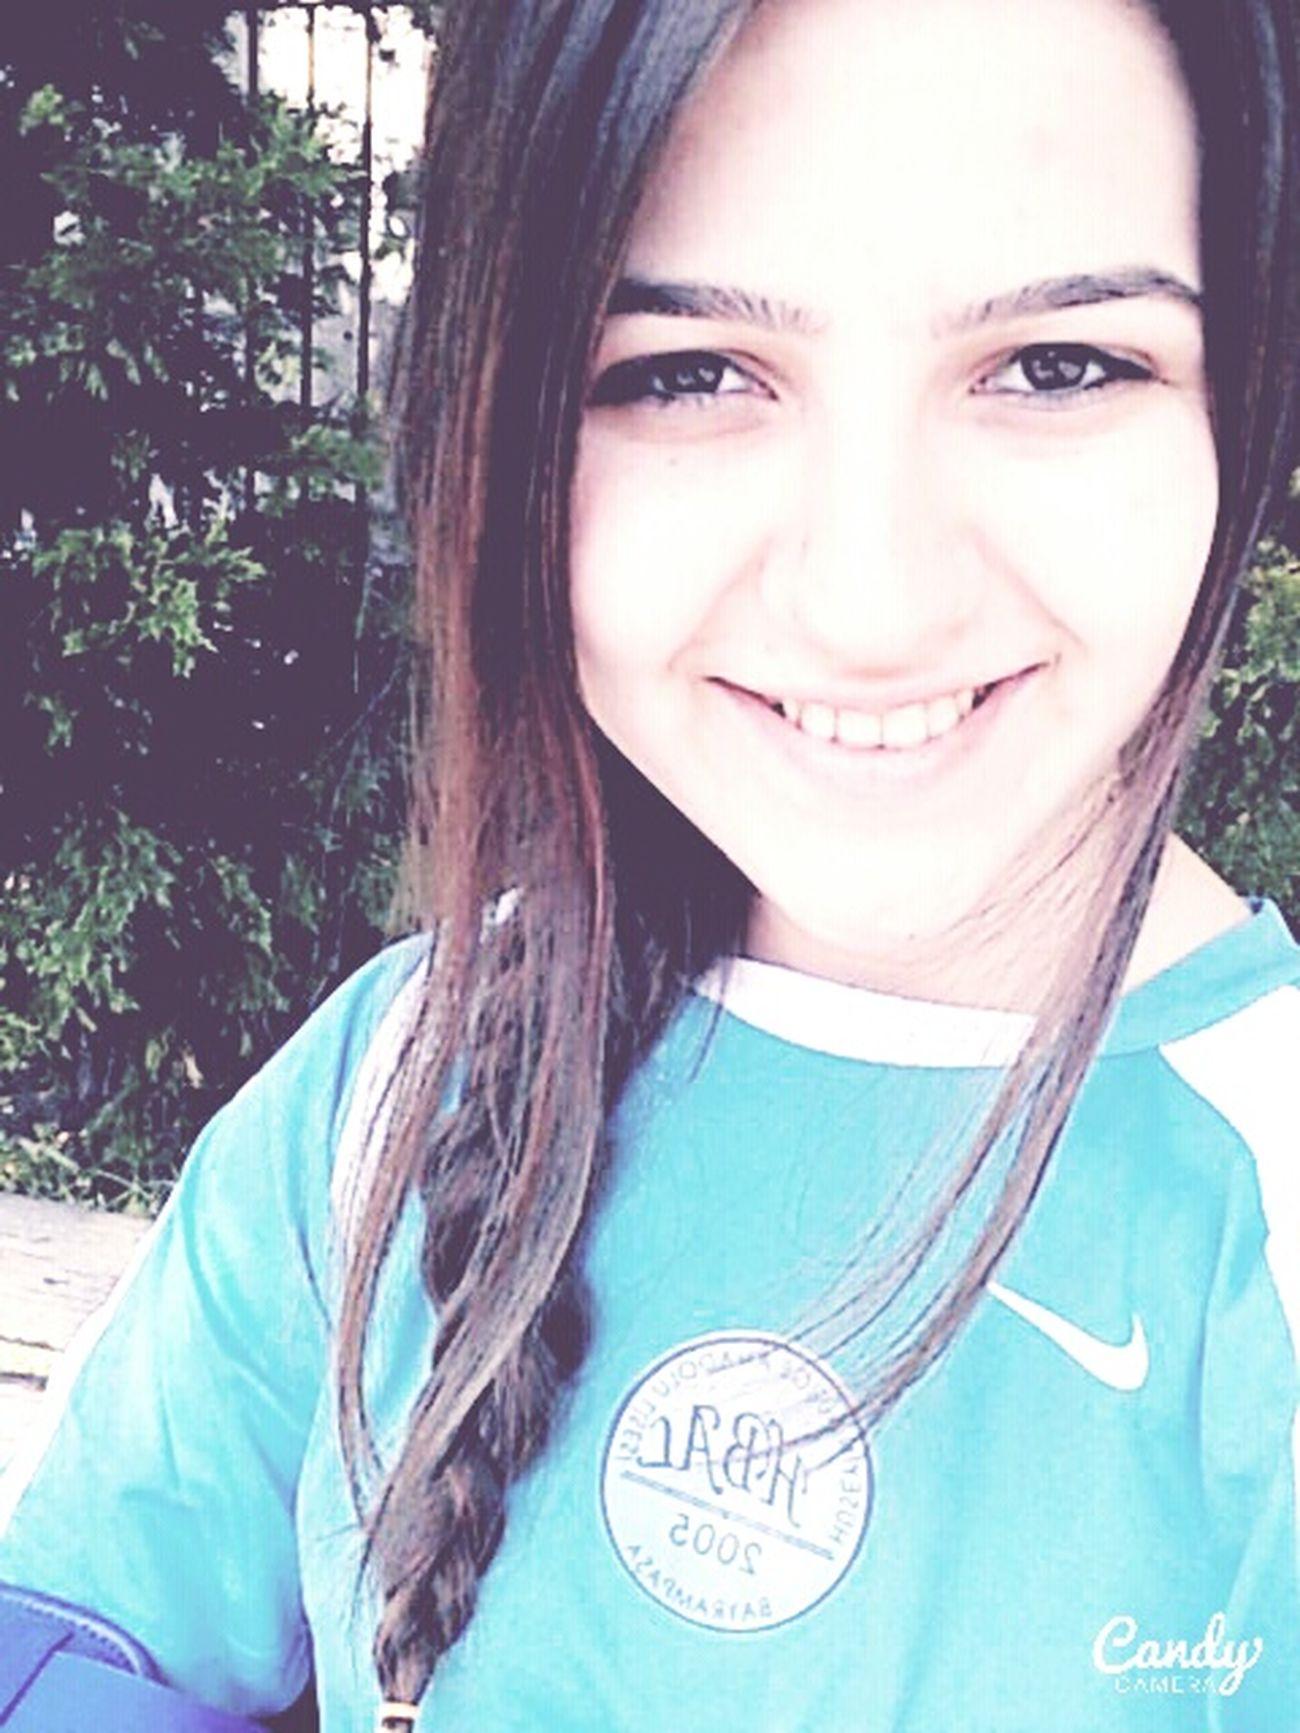 ✌✌✌🙊🙈😄 Hbal Masatenisi That's Me Selfie✌